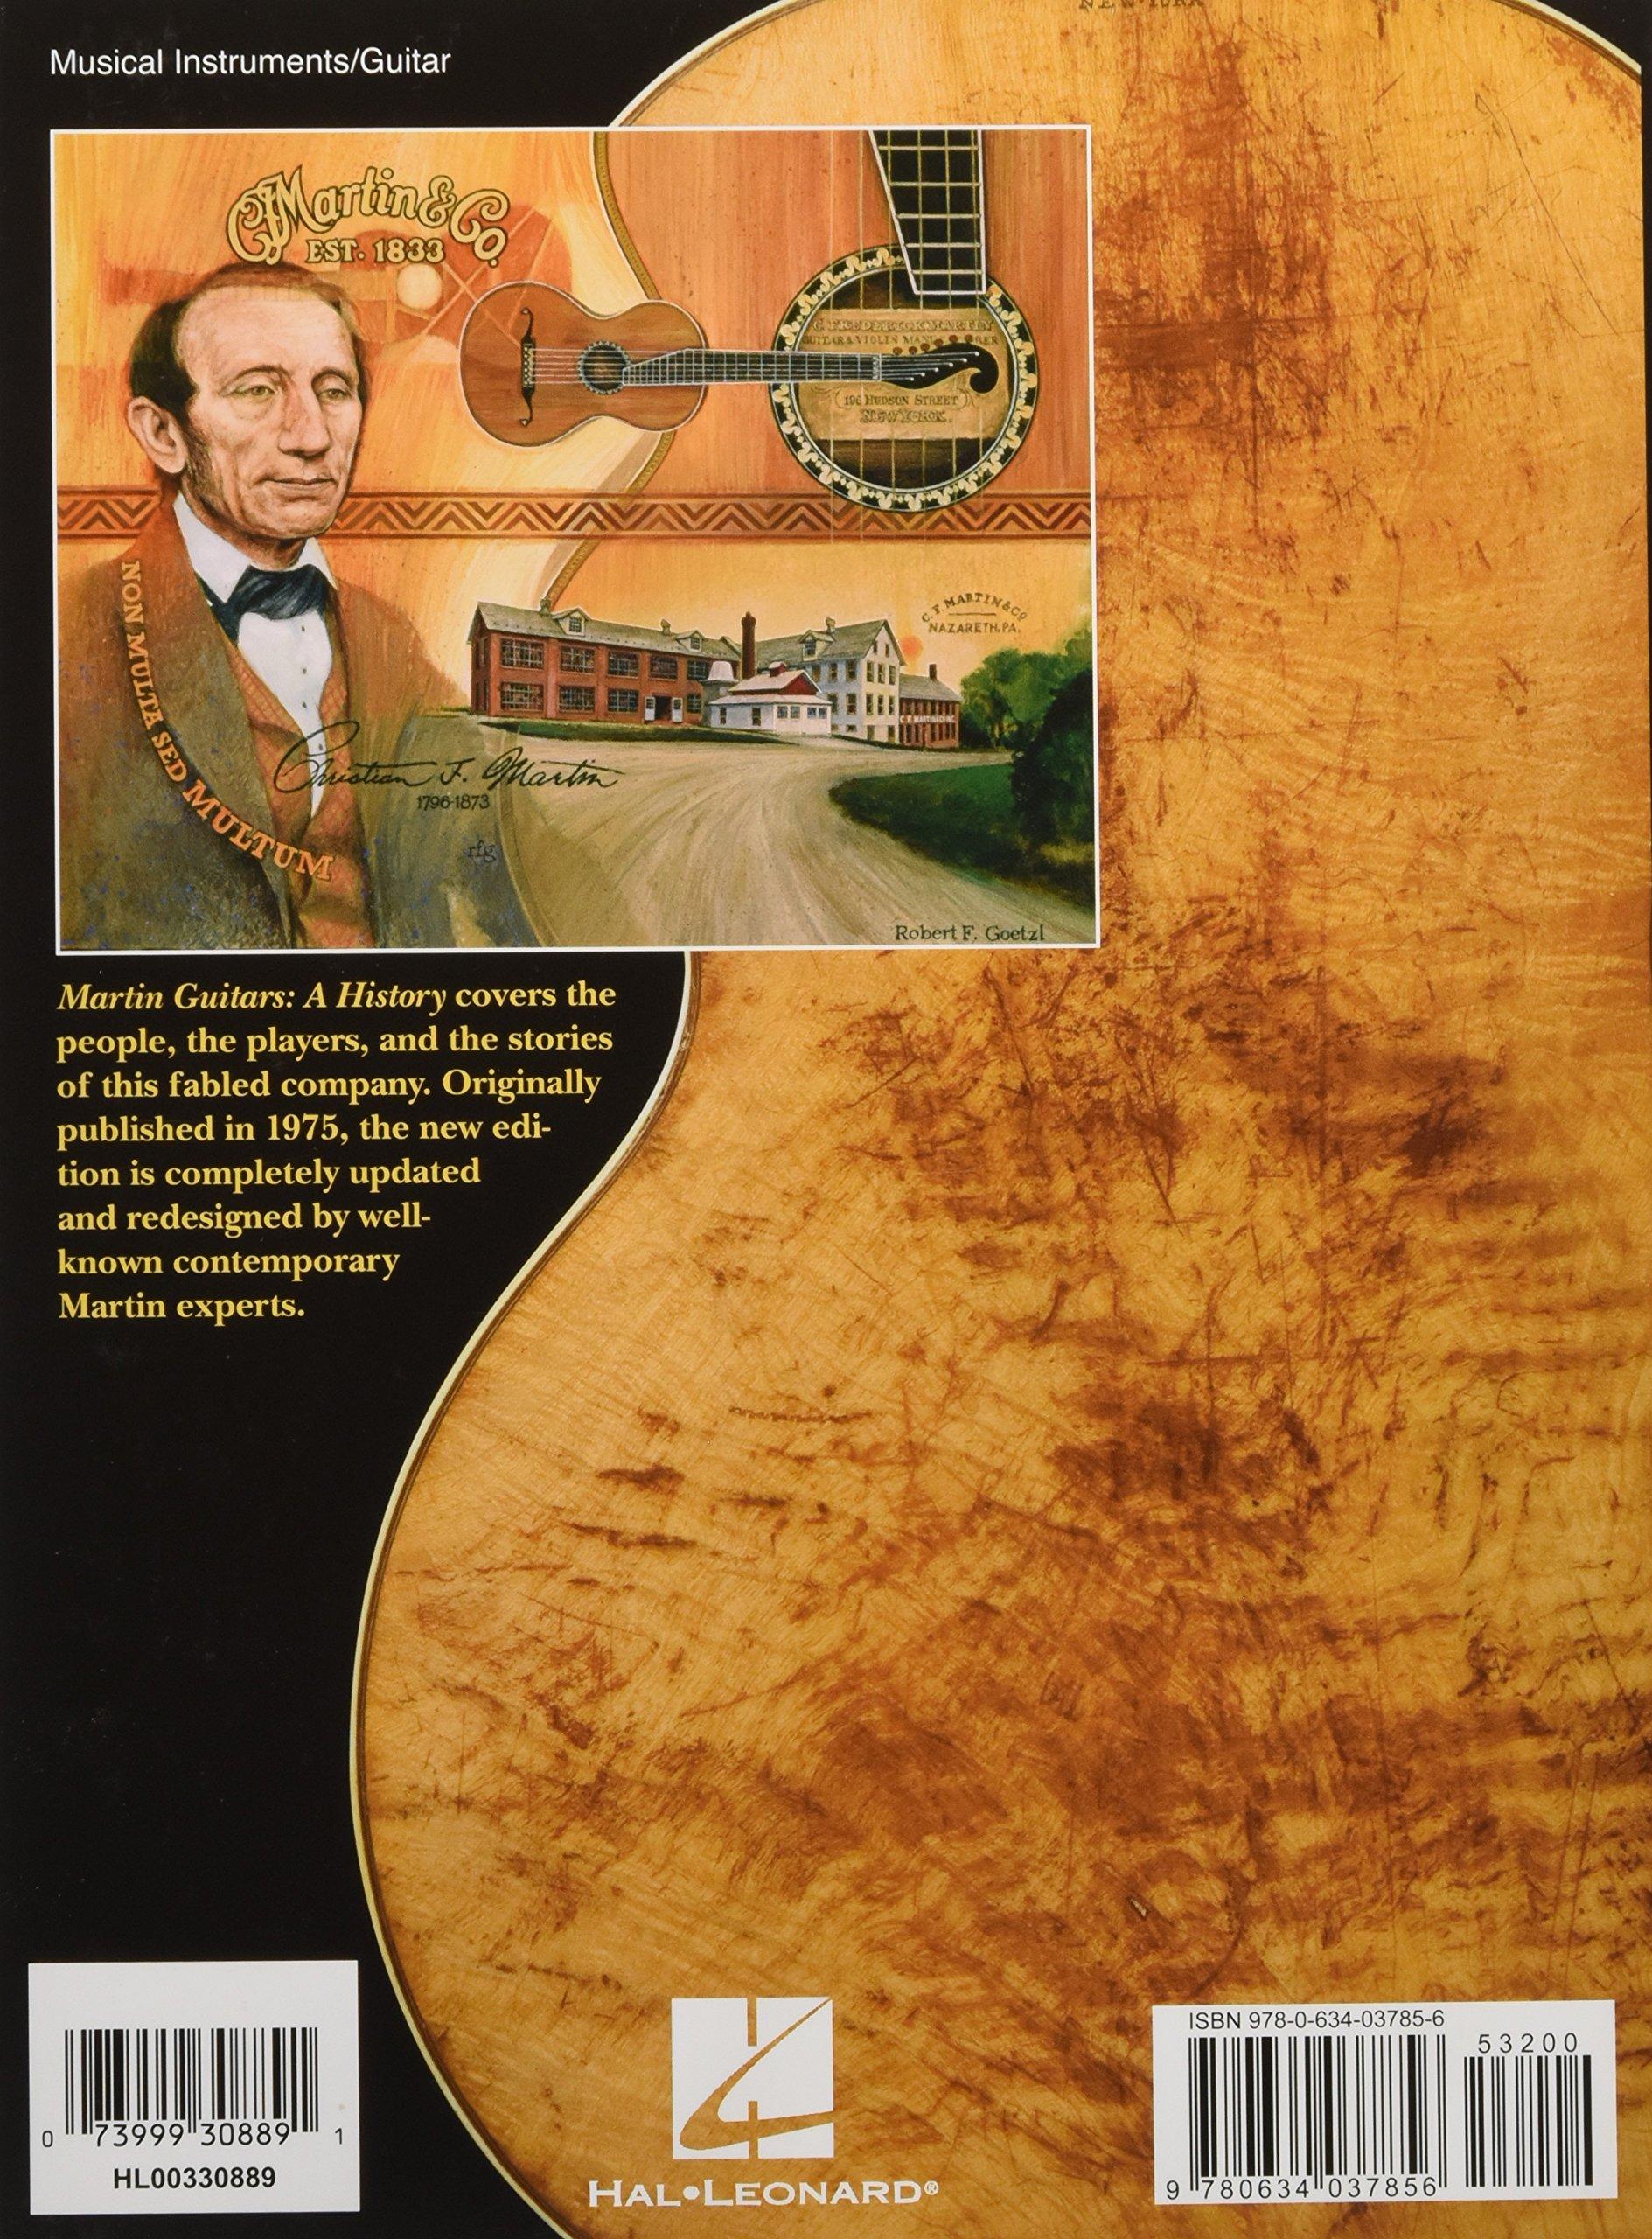 Martin Guitars: A History by Hal Leonard